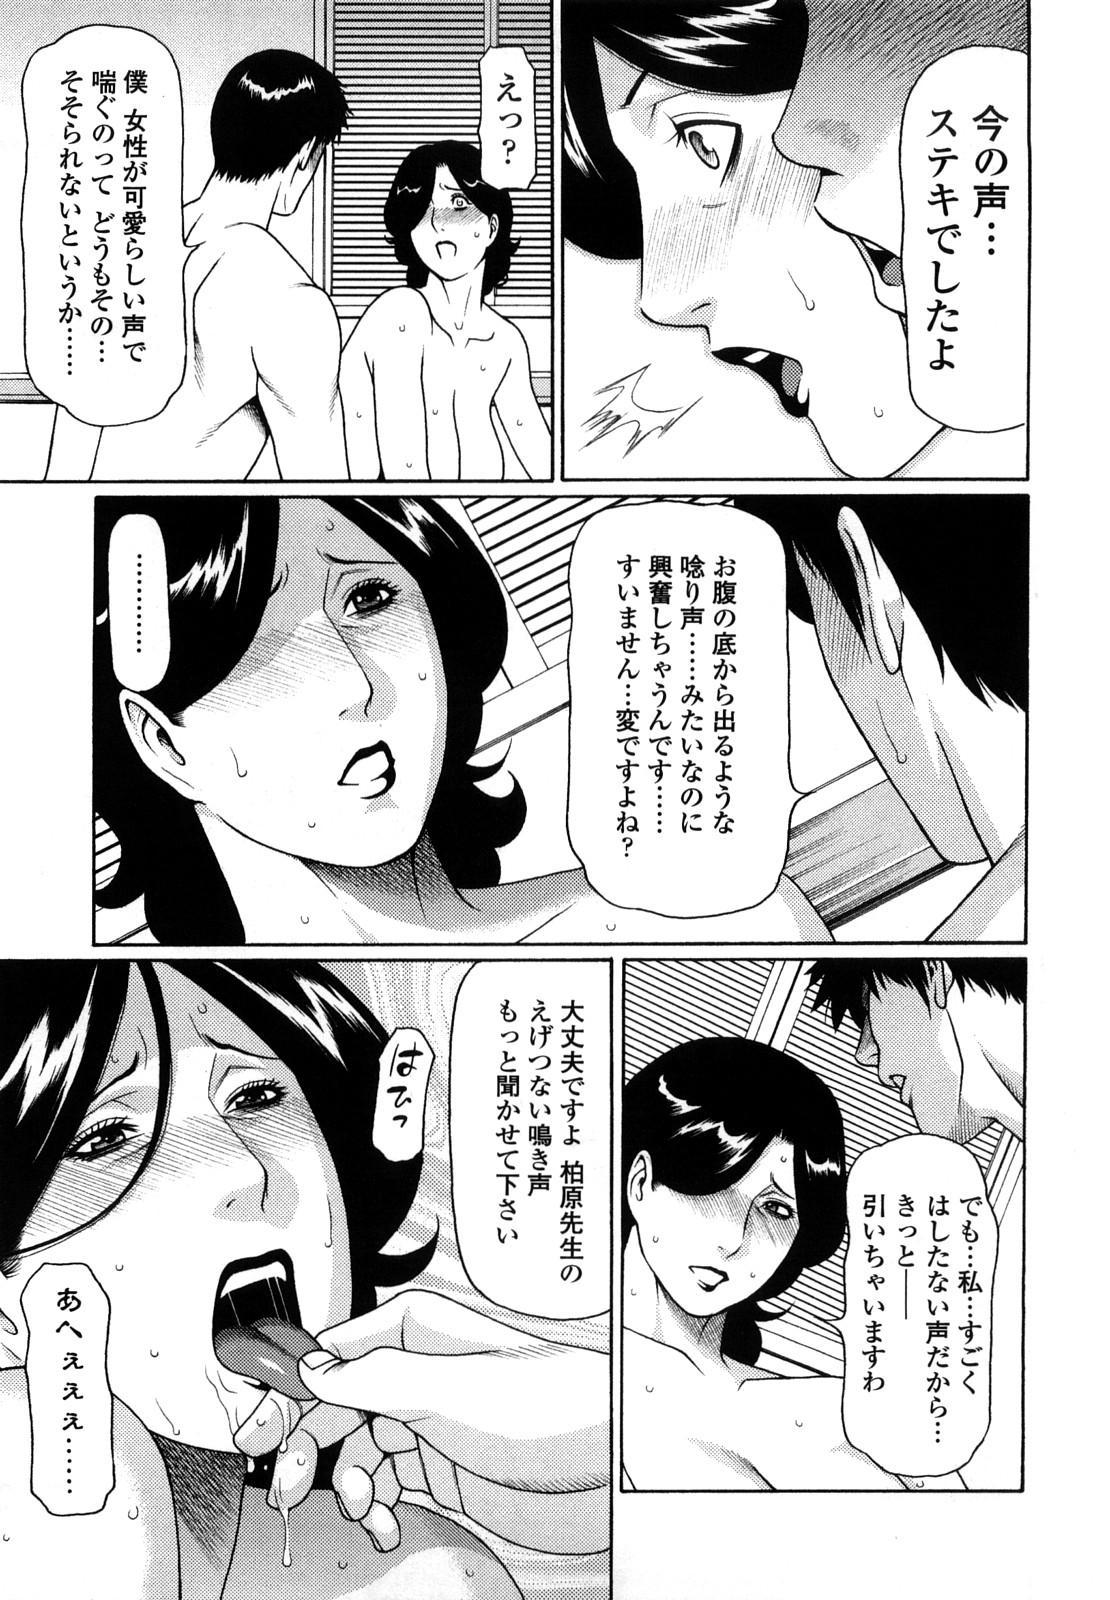 [Takasugi Kou] Kindan no Haha-Ana - Immorality Love-Hole [Decensored] 182